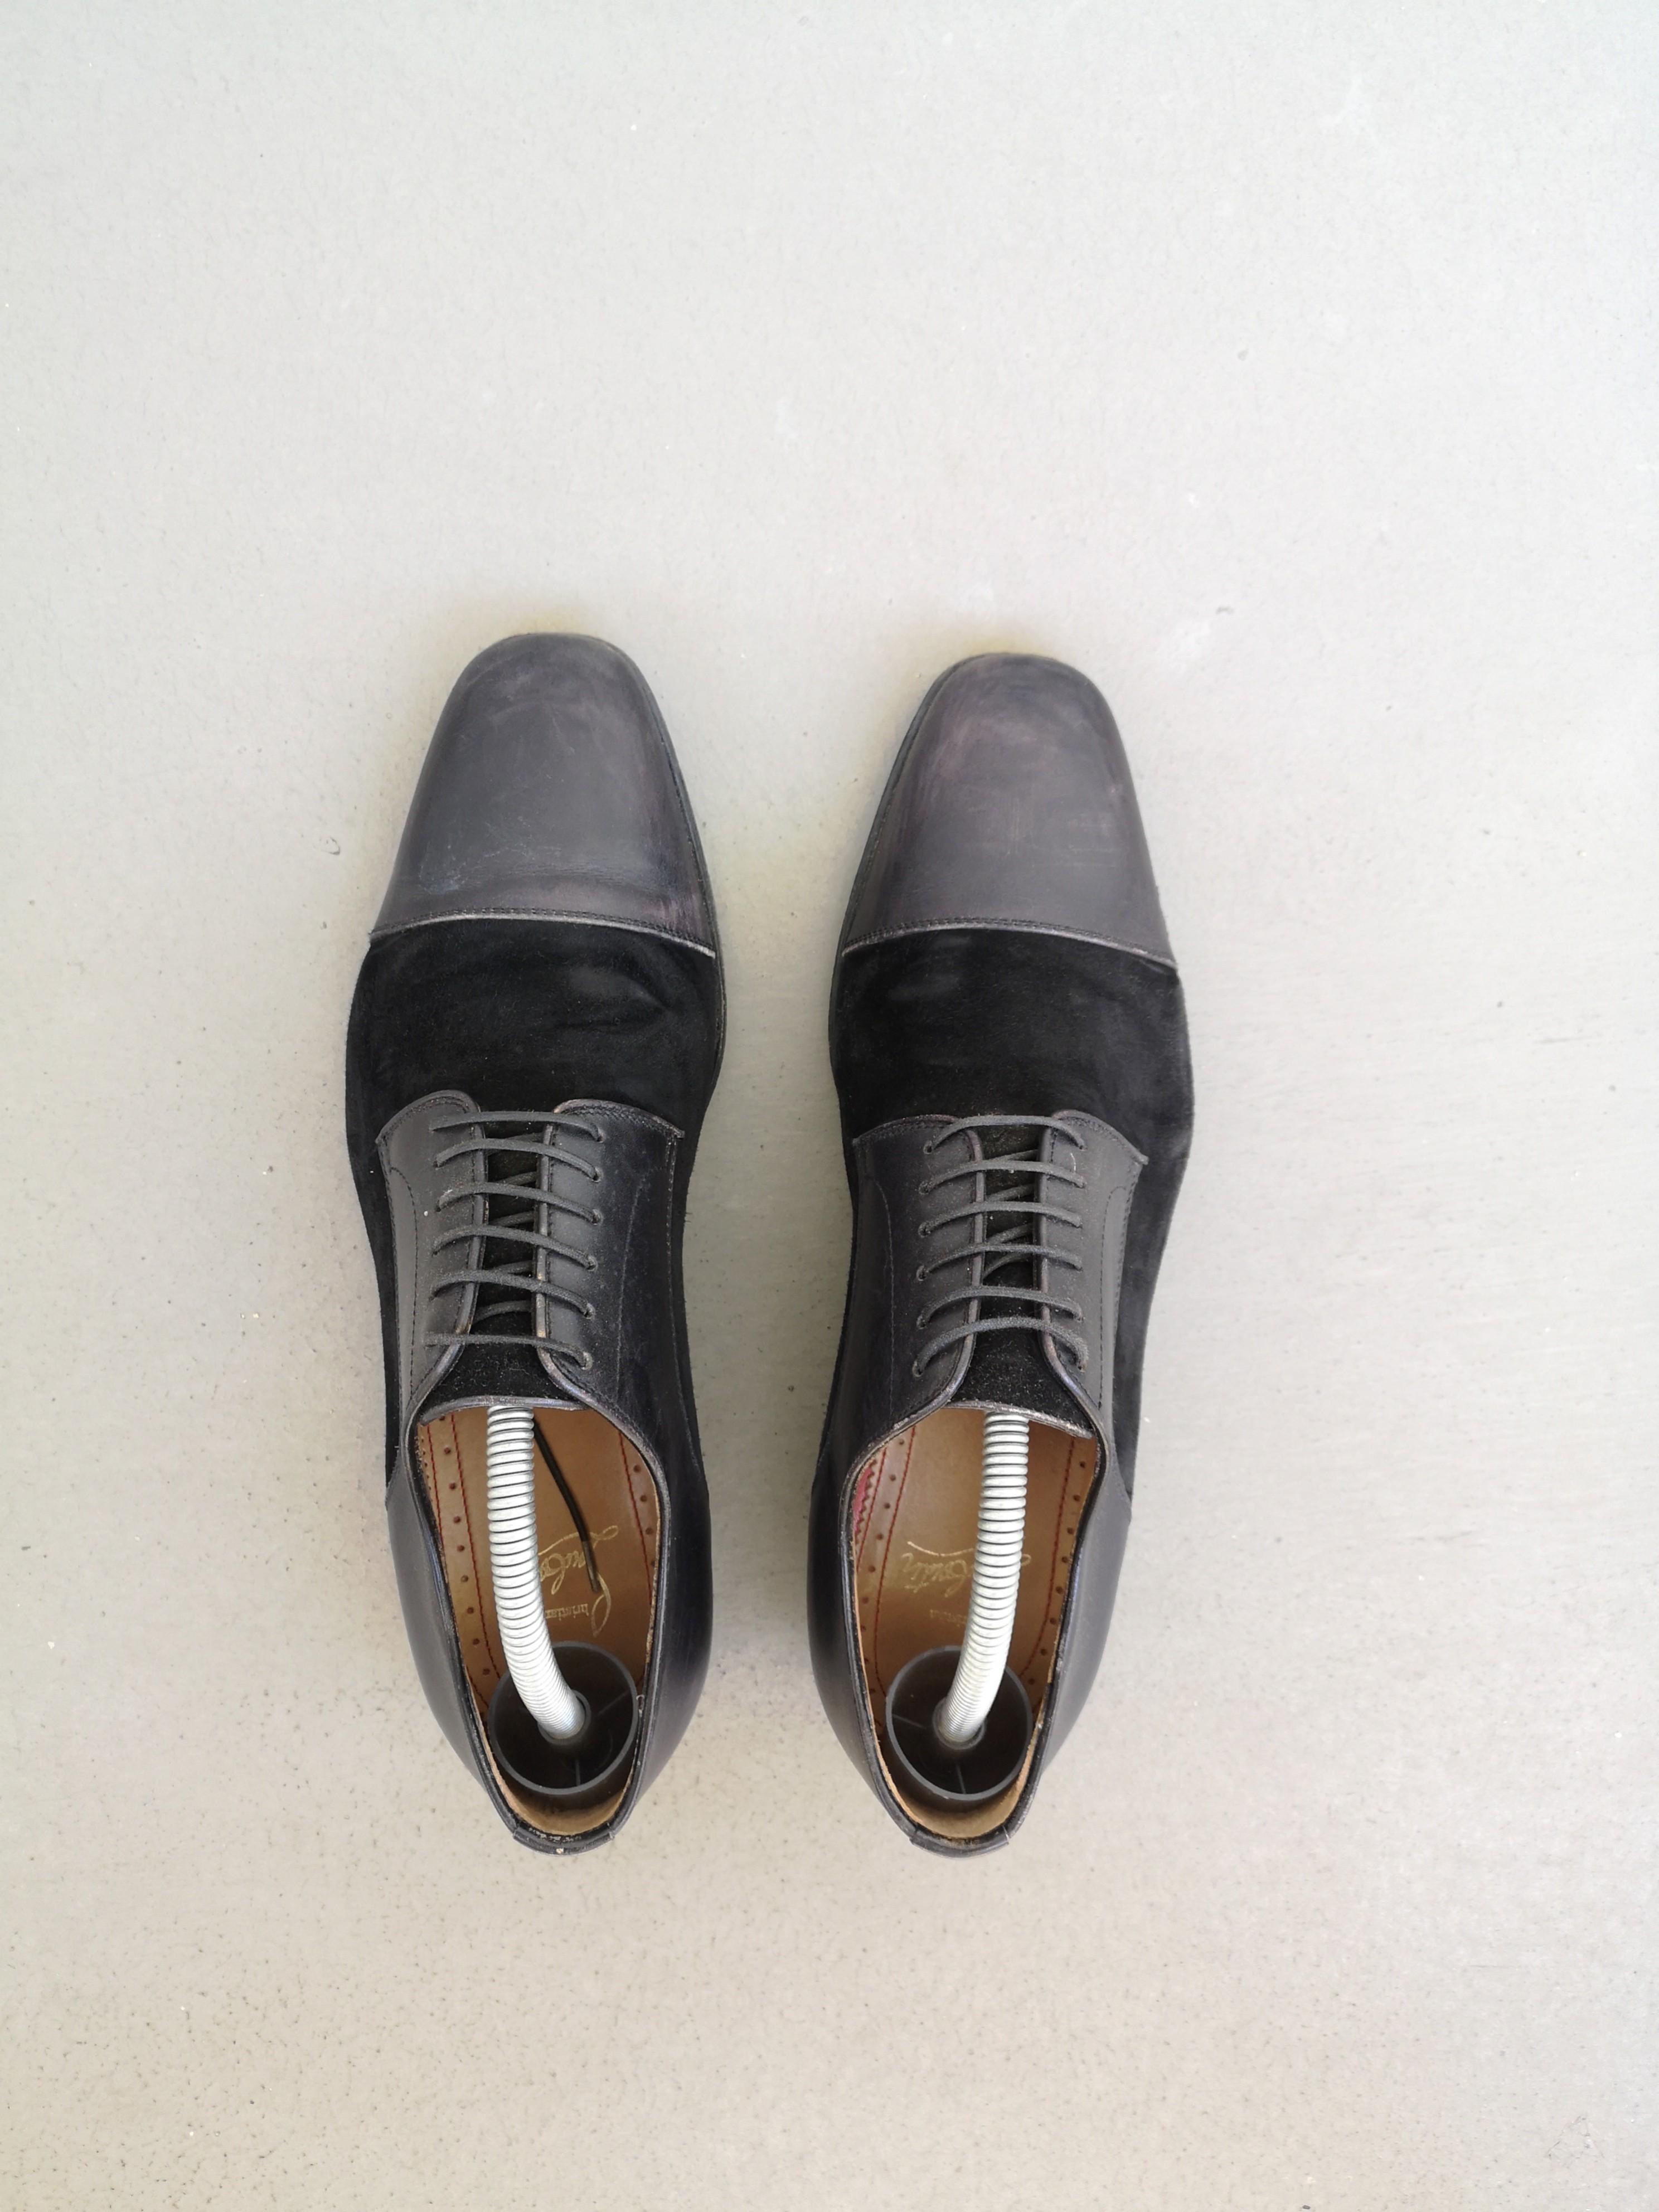 Christian Louboutin Greggo Orlato Shoes